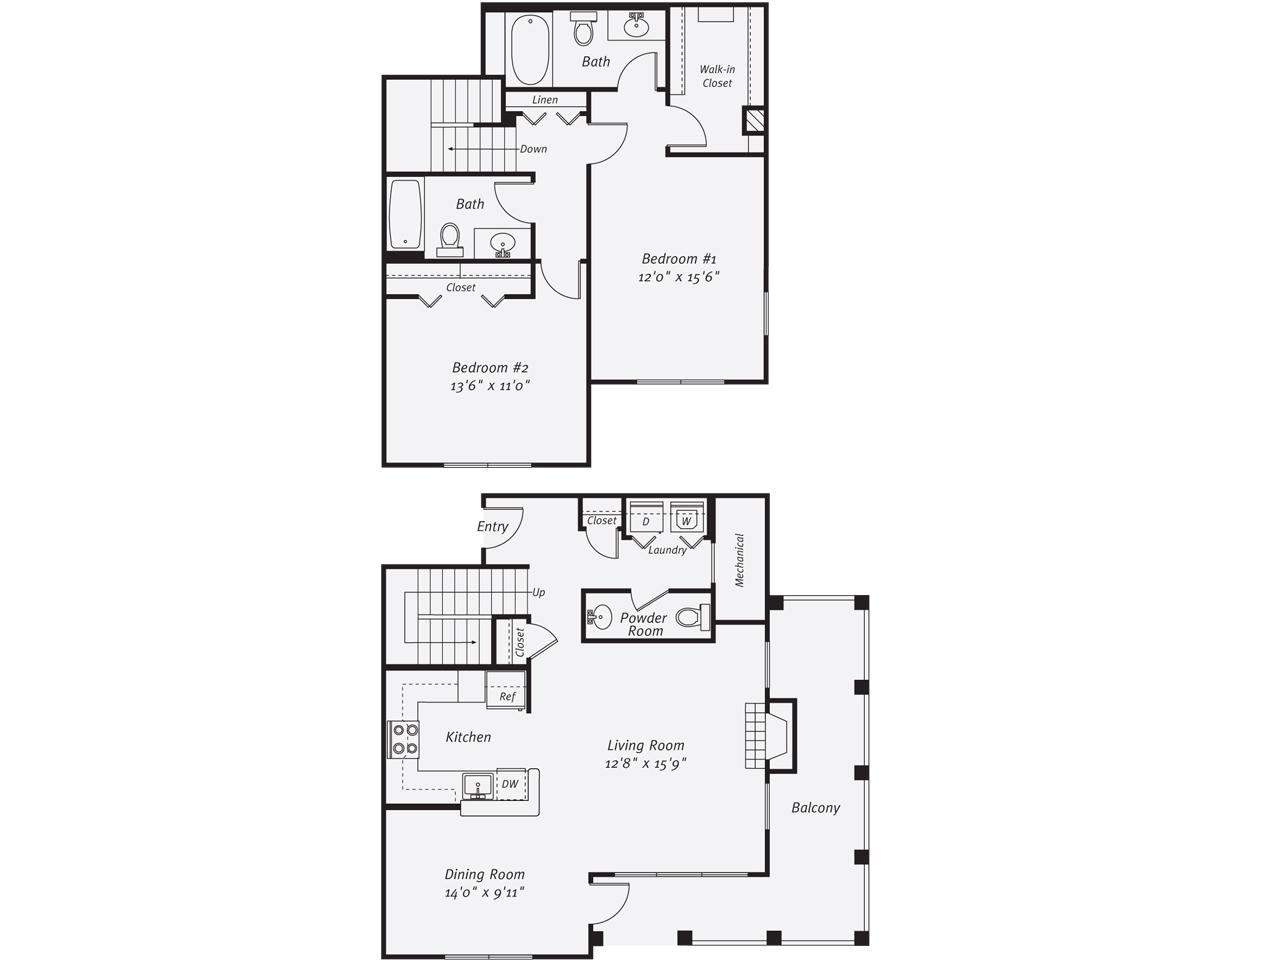 Ny coram thepointatpineridge p0571769 ny014 bt9 2 floorplan